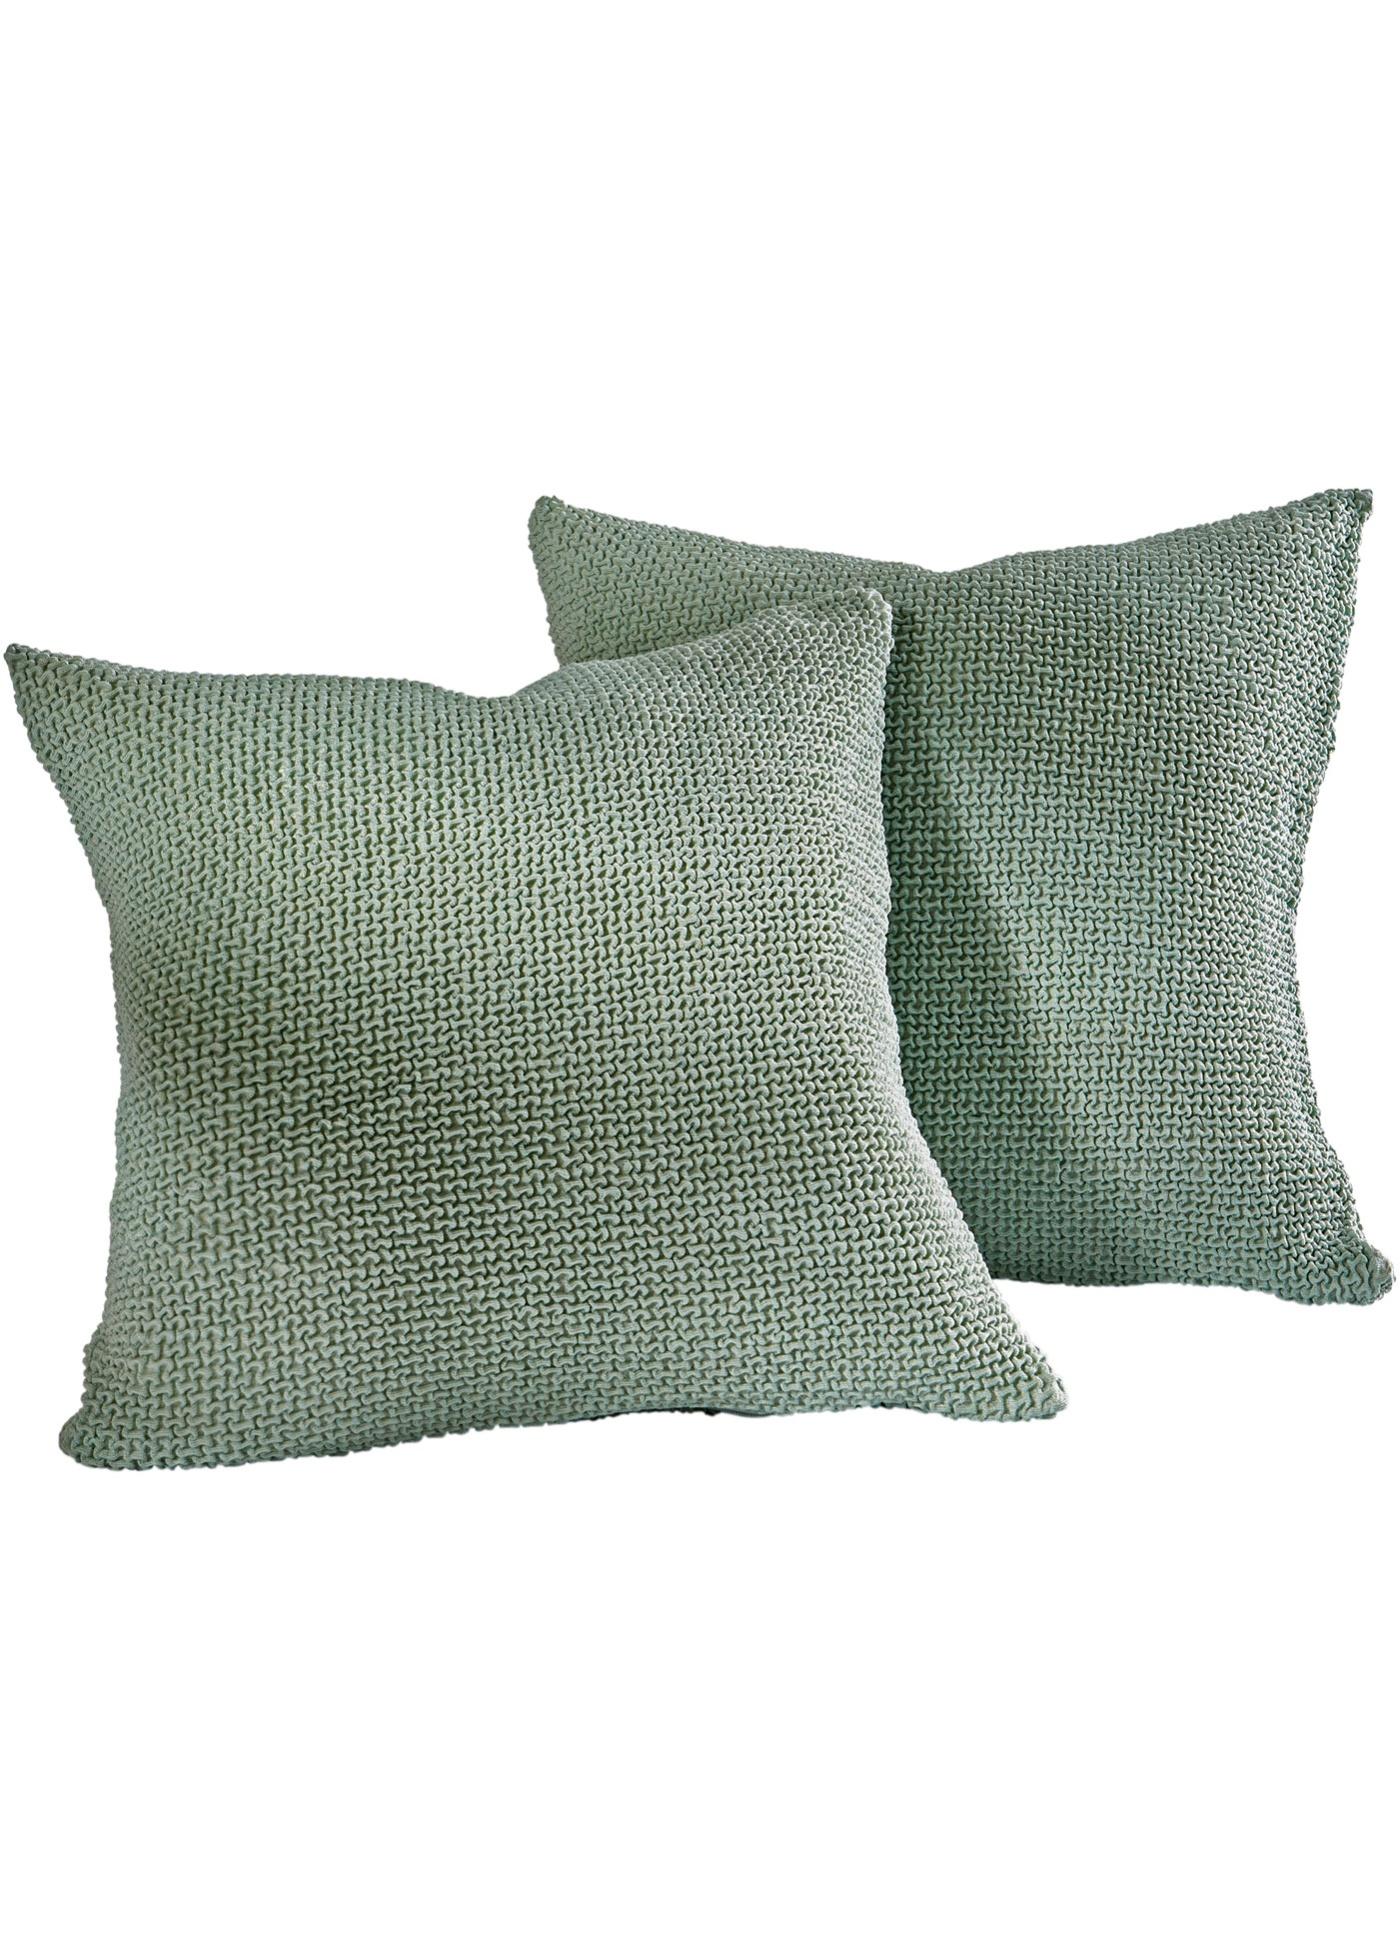 Copridivano Pastello (Verde) - bpc living bonprix collection